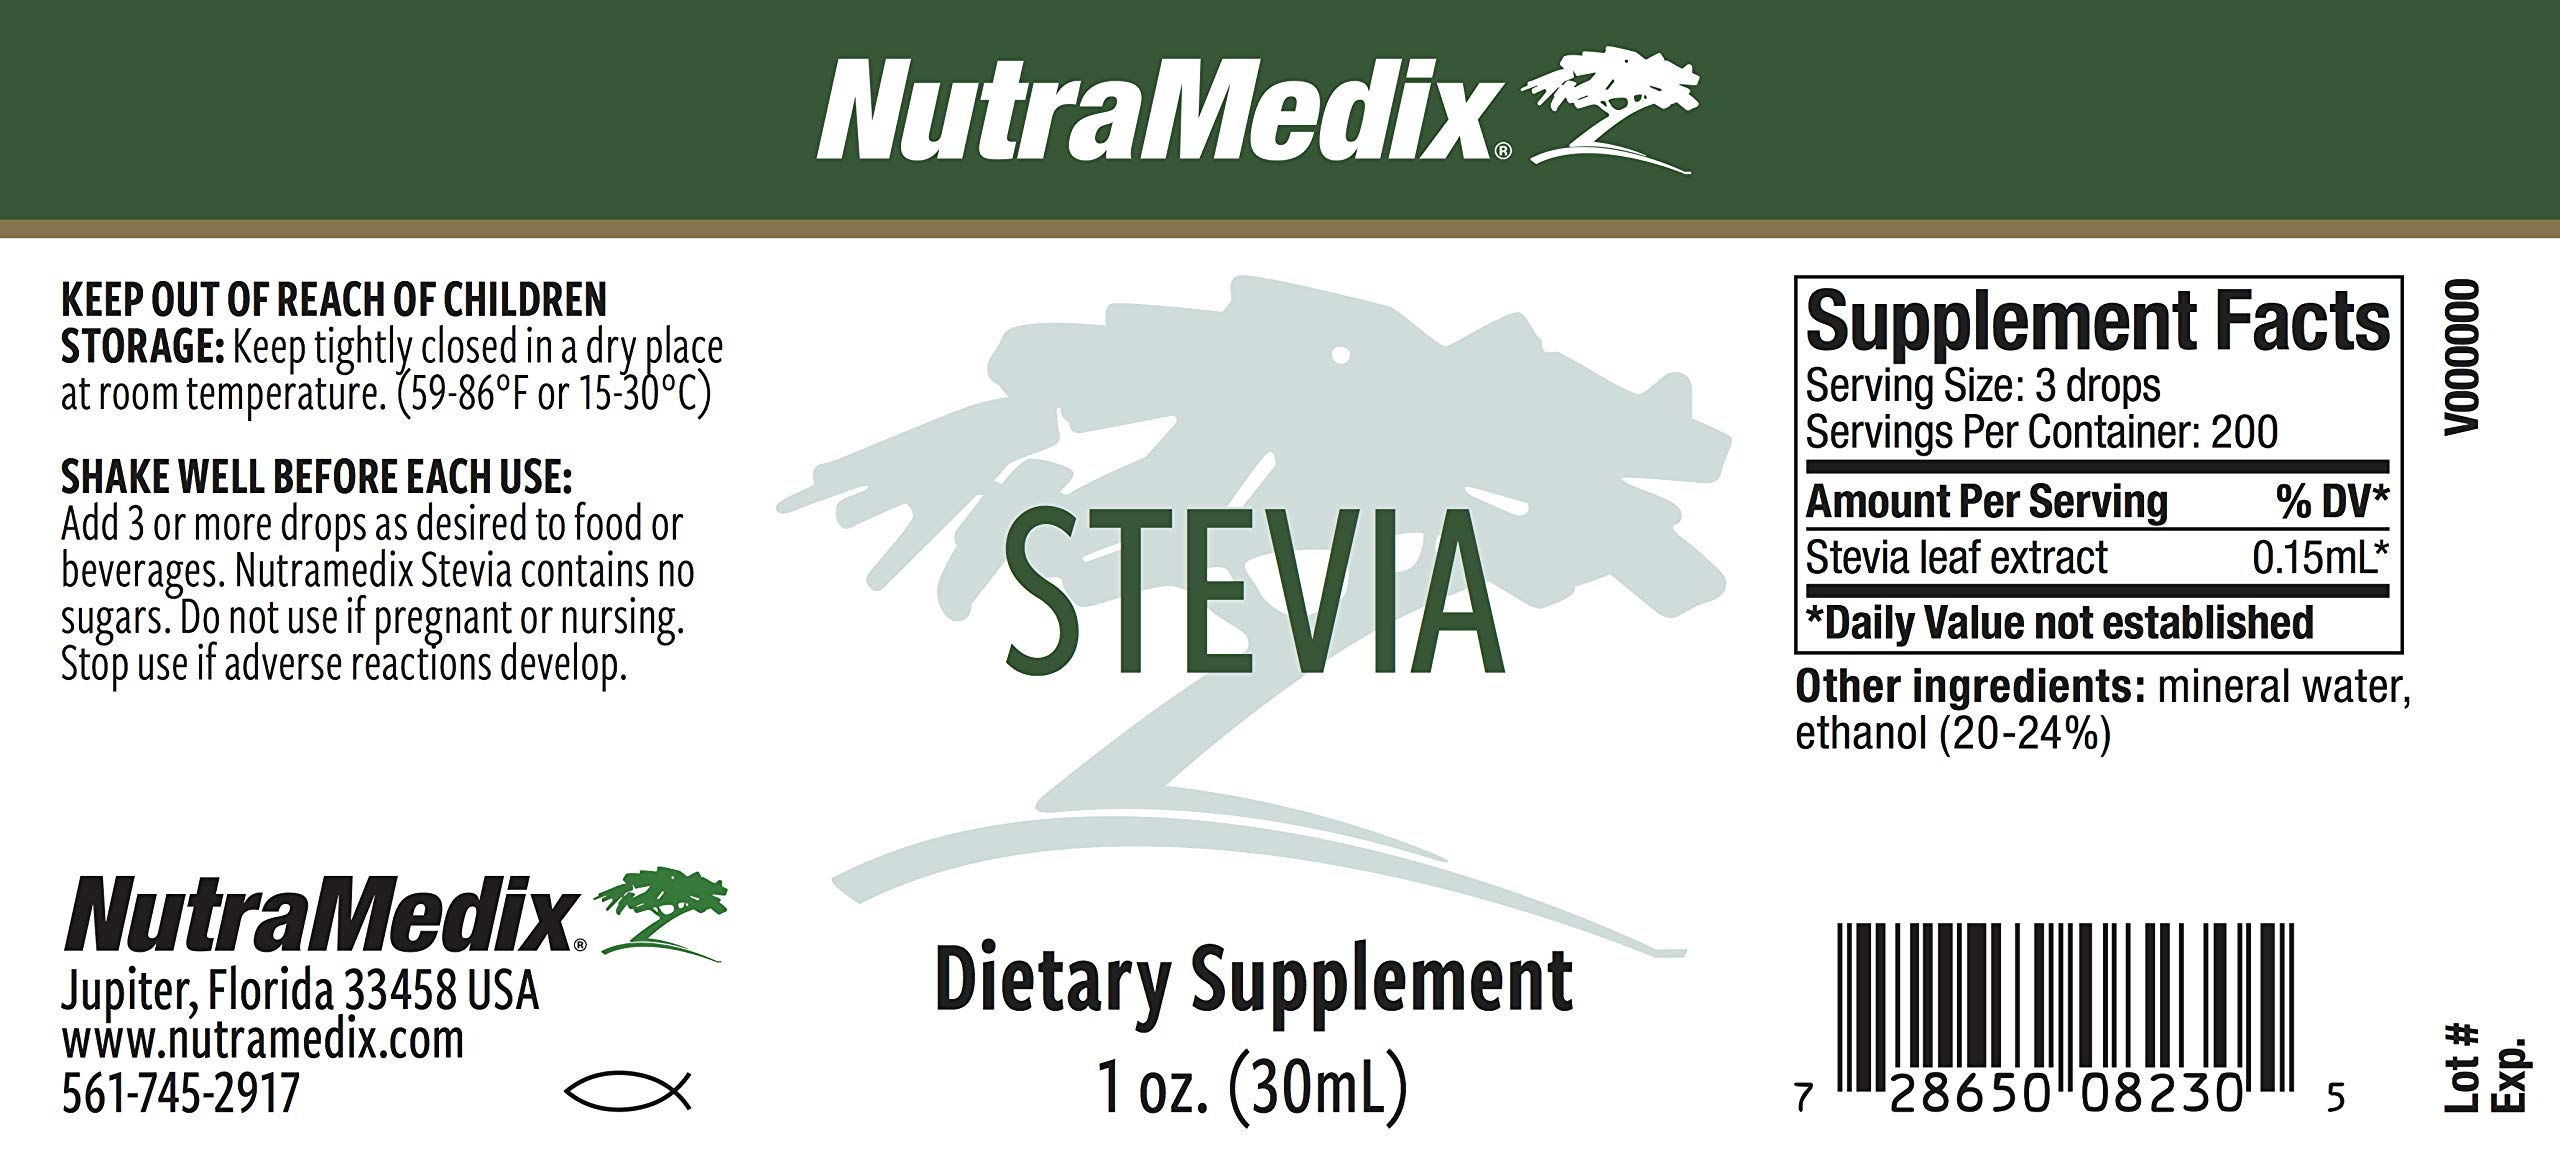 NutraMedix Stevia - 1 oz (30mL)